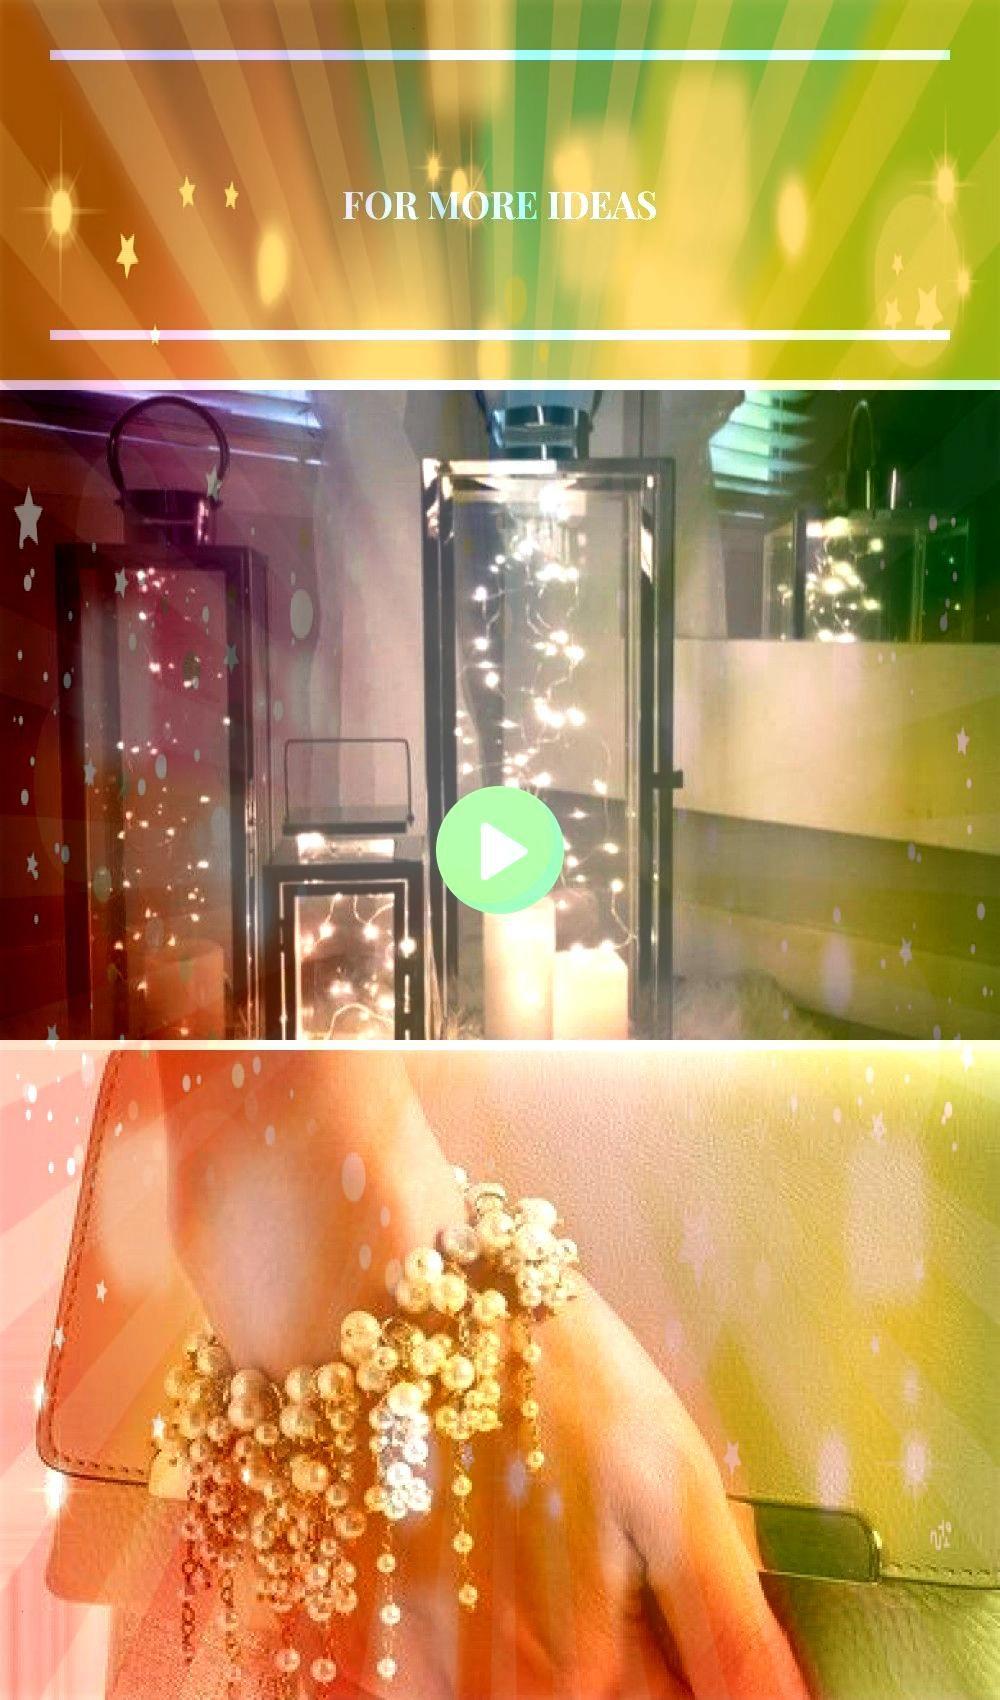 und Armaturen  Diy Living Room  chinaBeleuchtung und Armaturen  Diy Living Room  china Ramadan set Hollywood Vanity Mirror  Etsy Bespoke cotton sculptures Club Monacos fl...